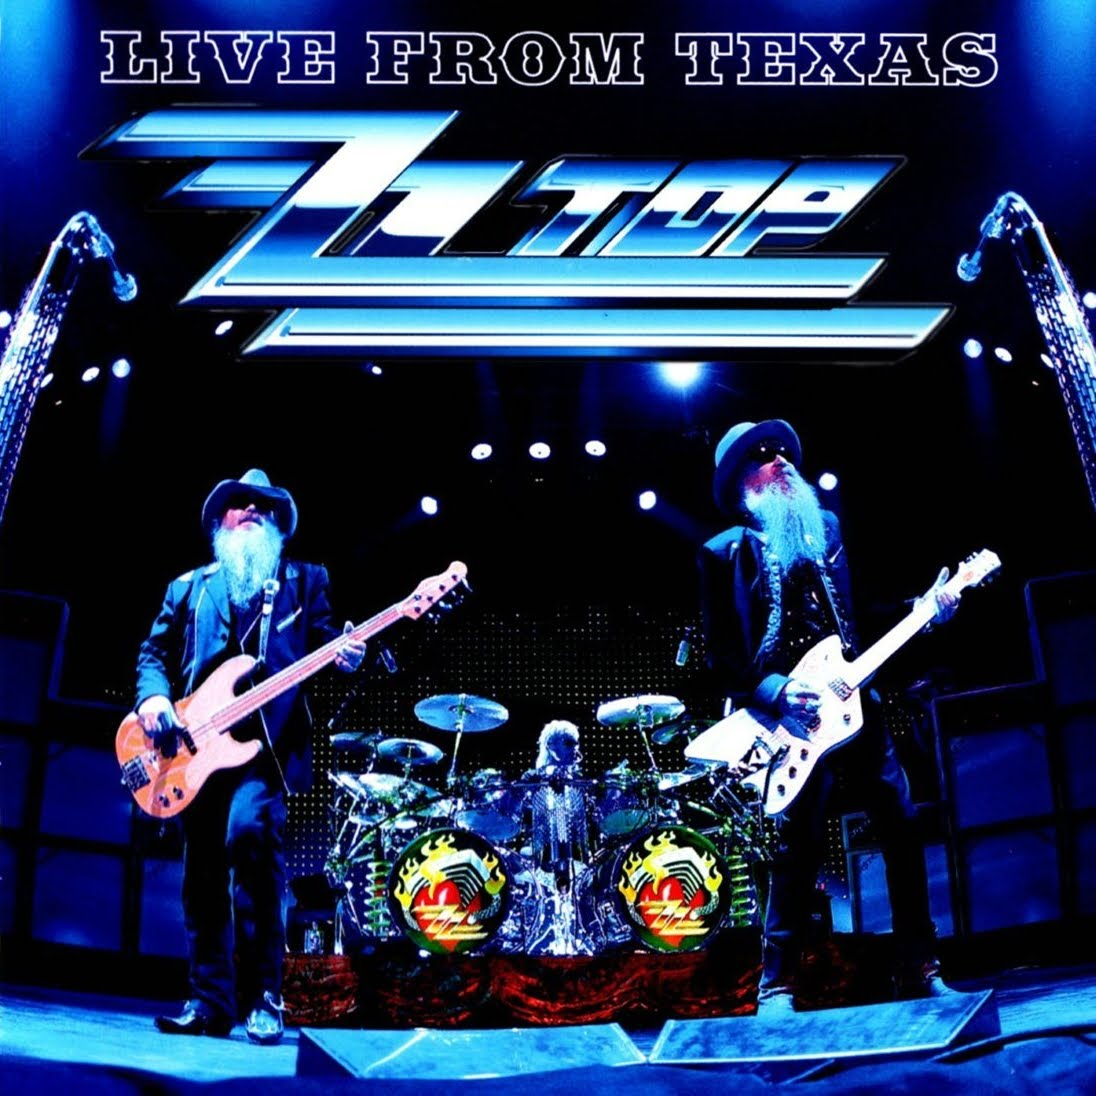 Zz top live from texas reviews - Zz top la grange drum cover ...